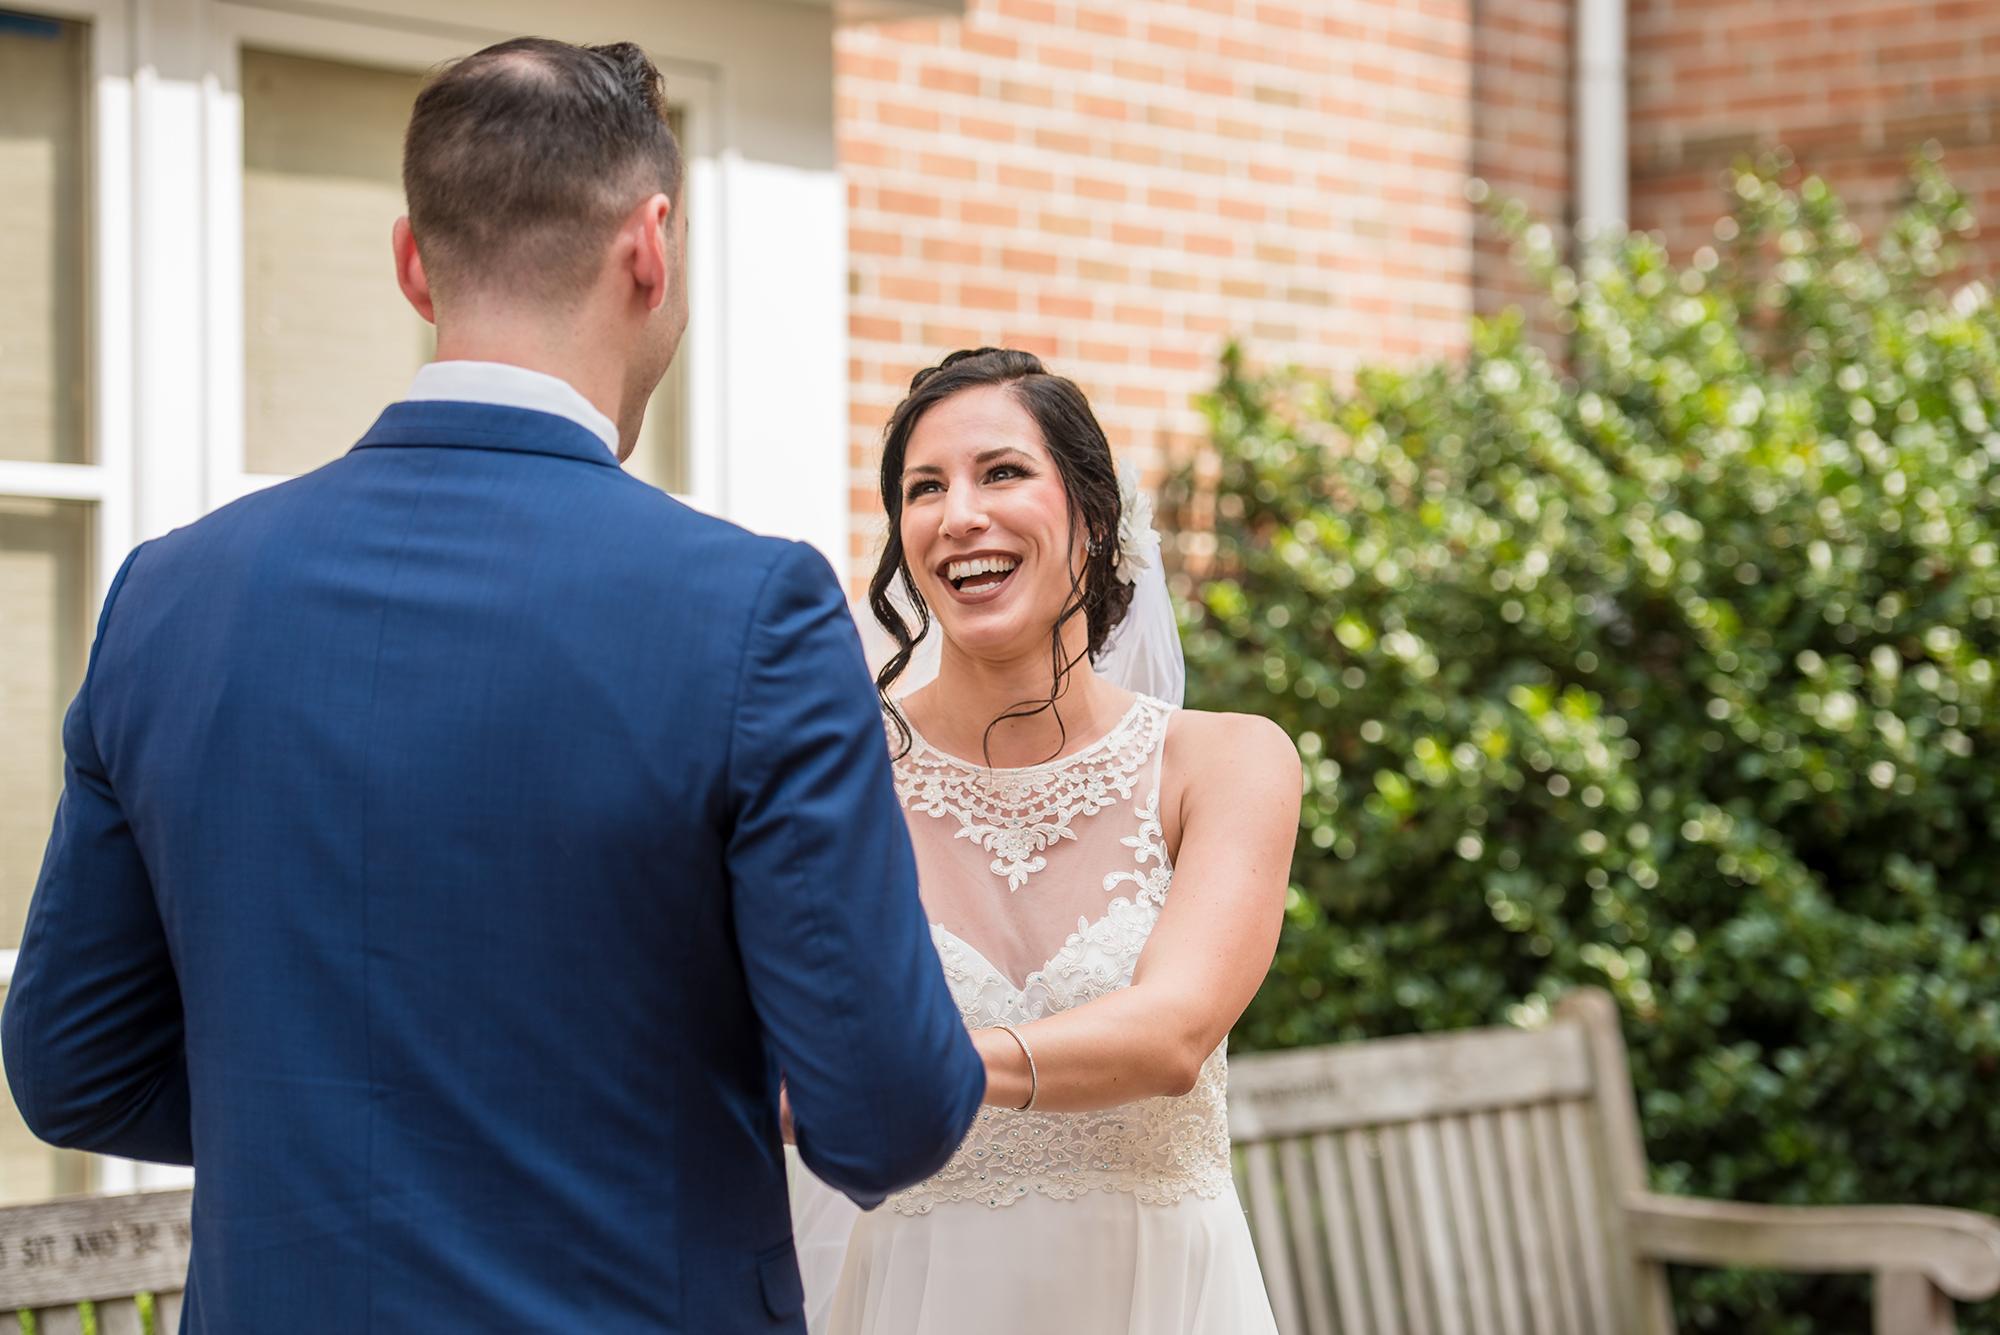 trenos-wedding-lbi-photographer-4.jpg